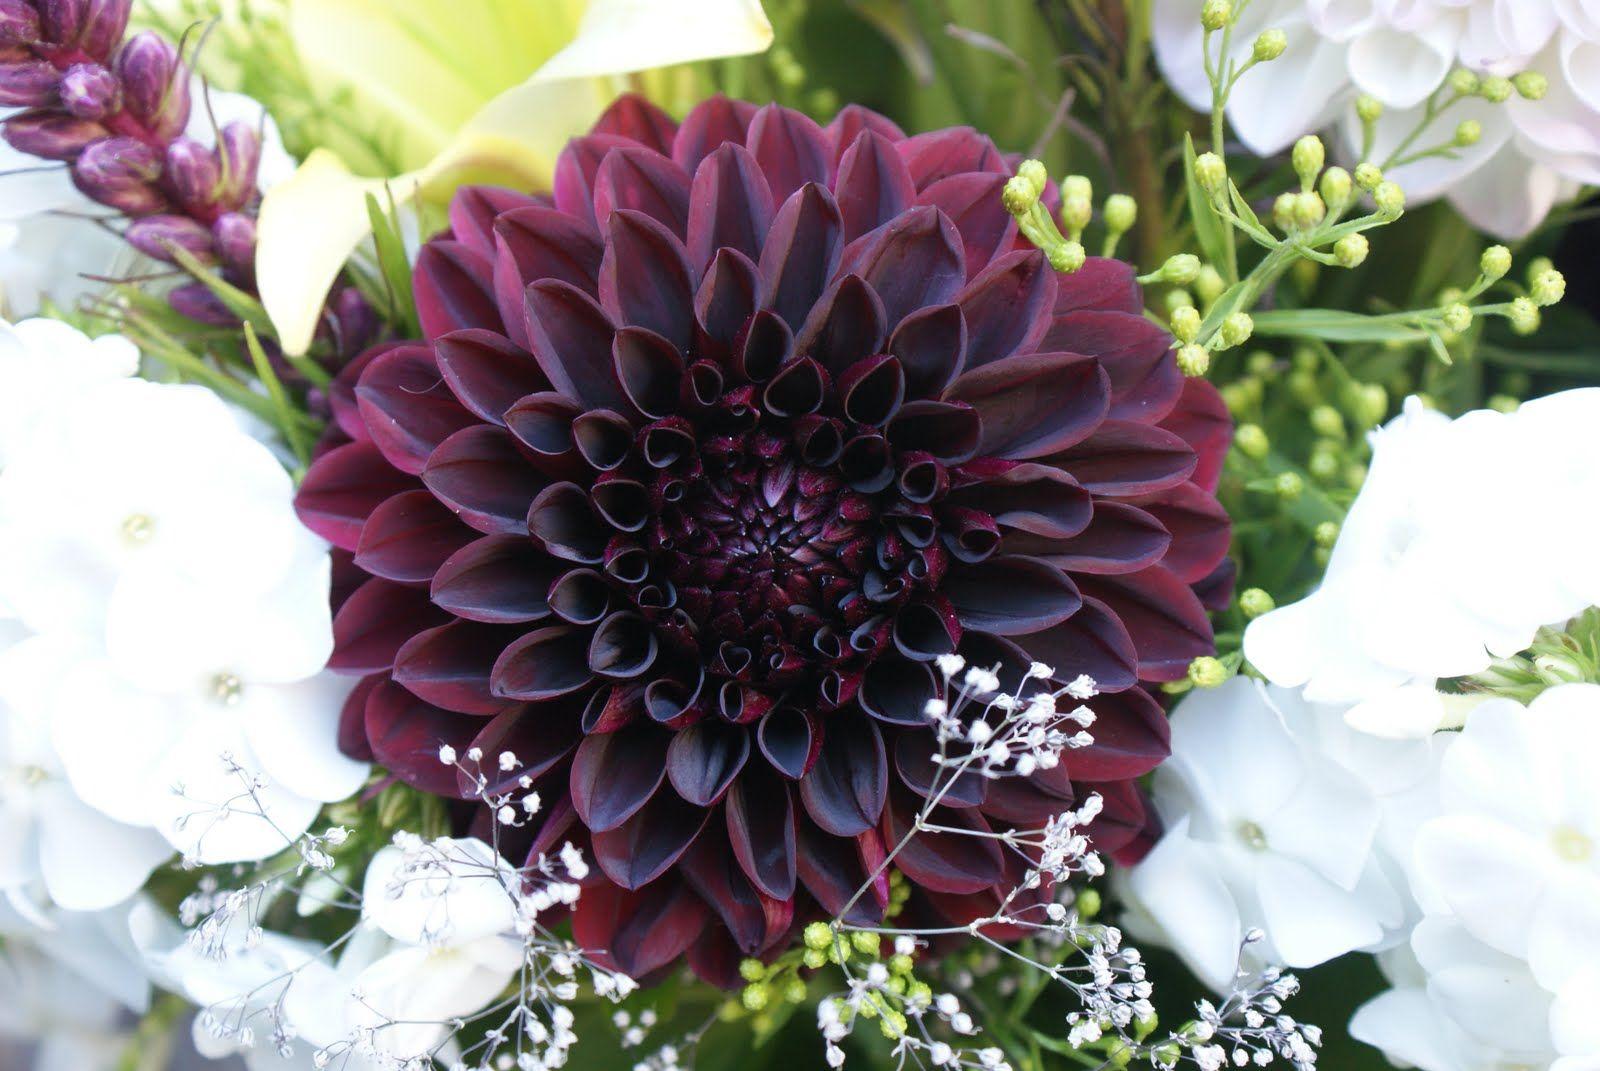 Black dahlia flower images amp pictures findpik